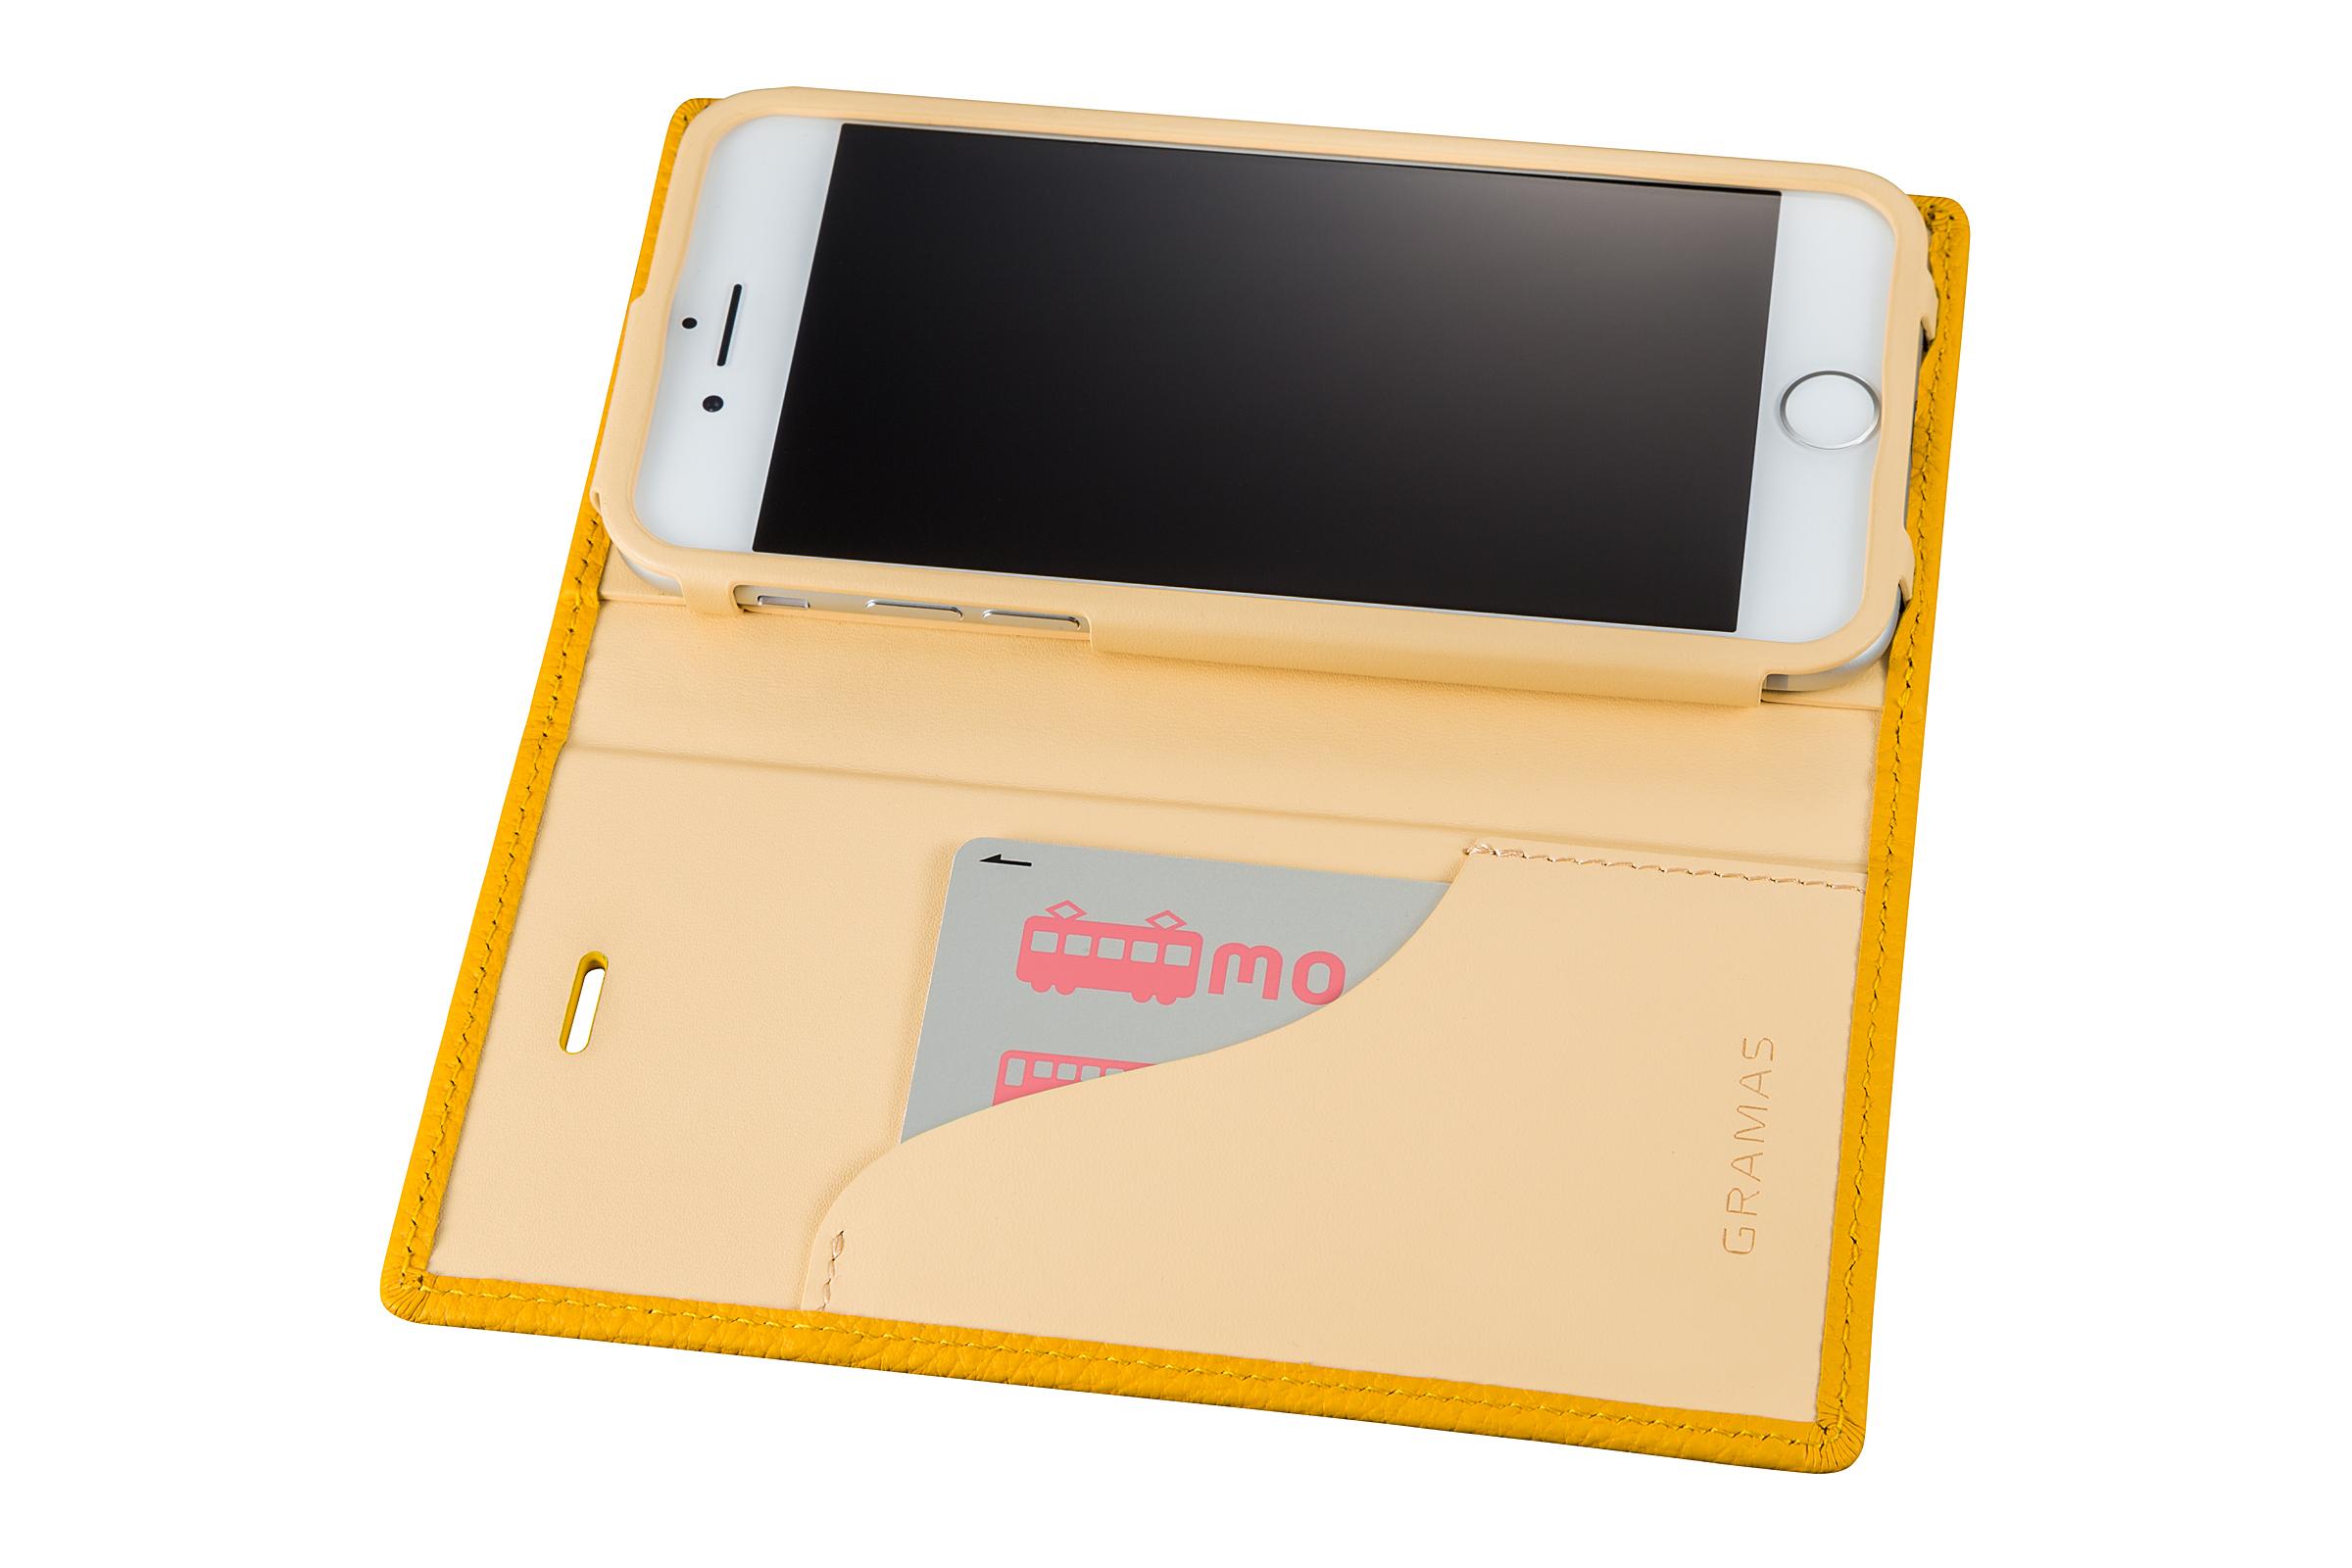 GRAMAS Shrunken-calf Full Leather Case for iPhone 7(Yellow) シュランケンカーフ 手帳型フルレザーケース - 画像4